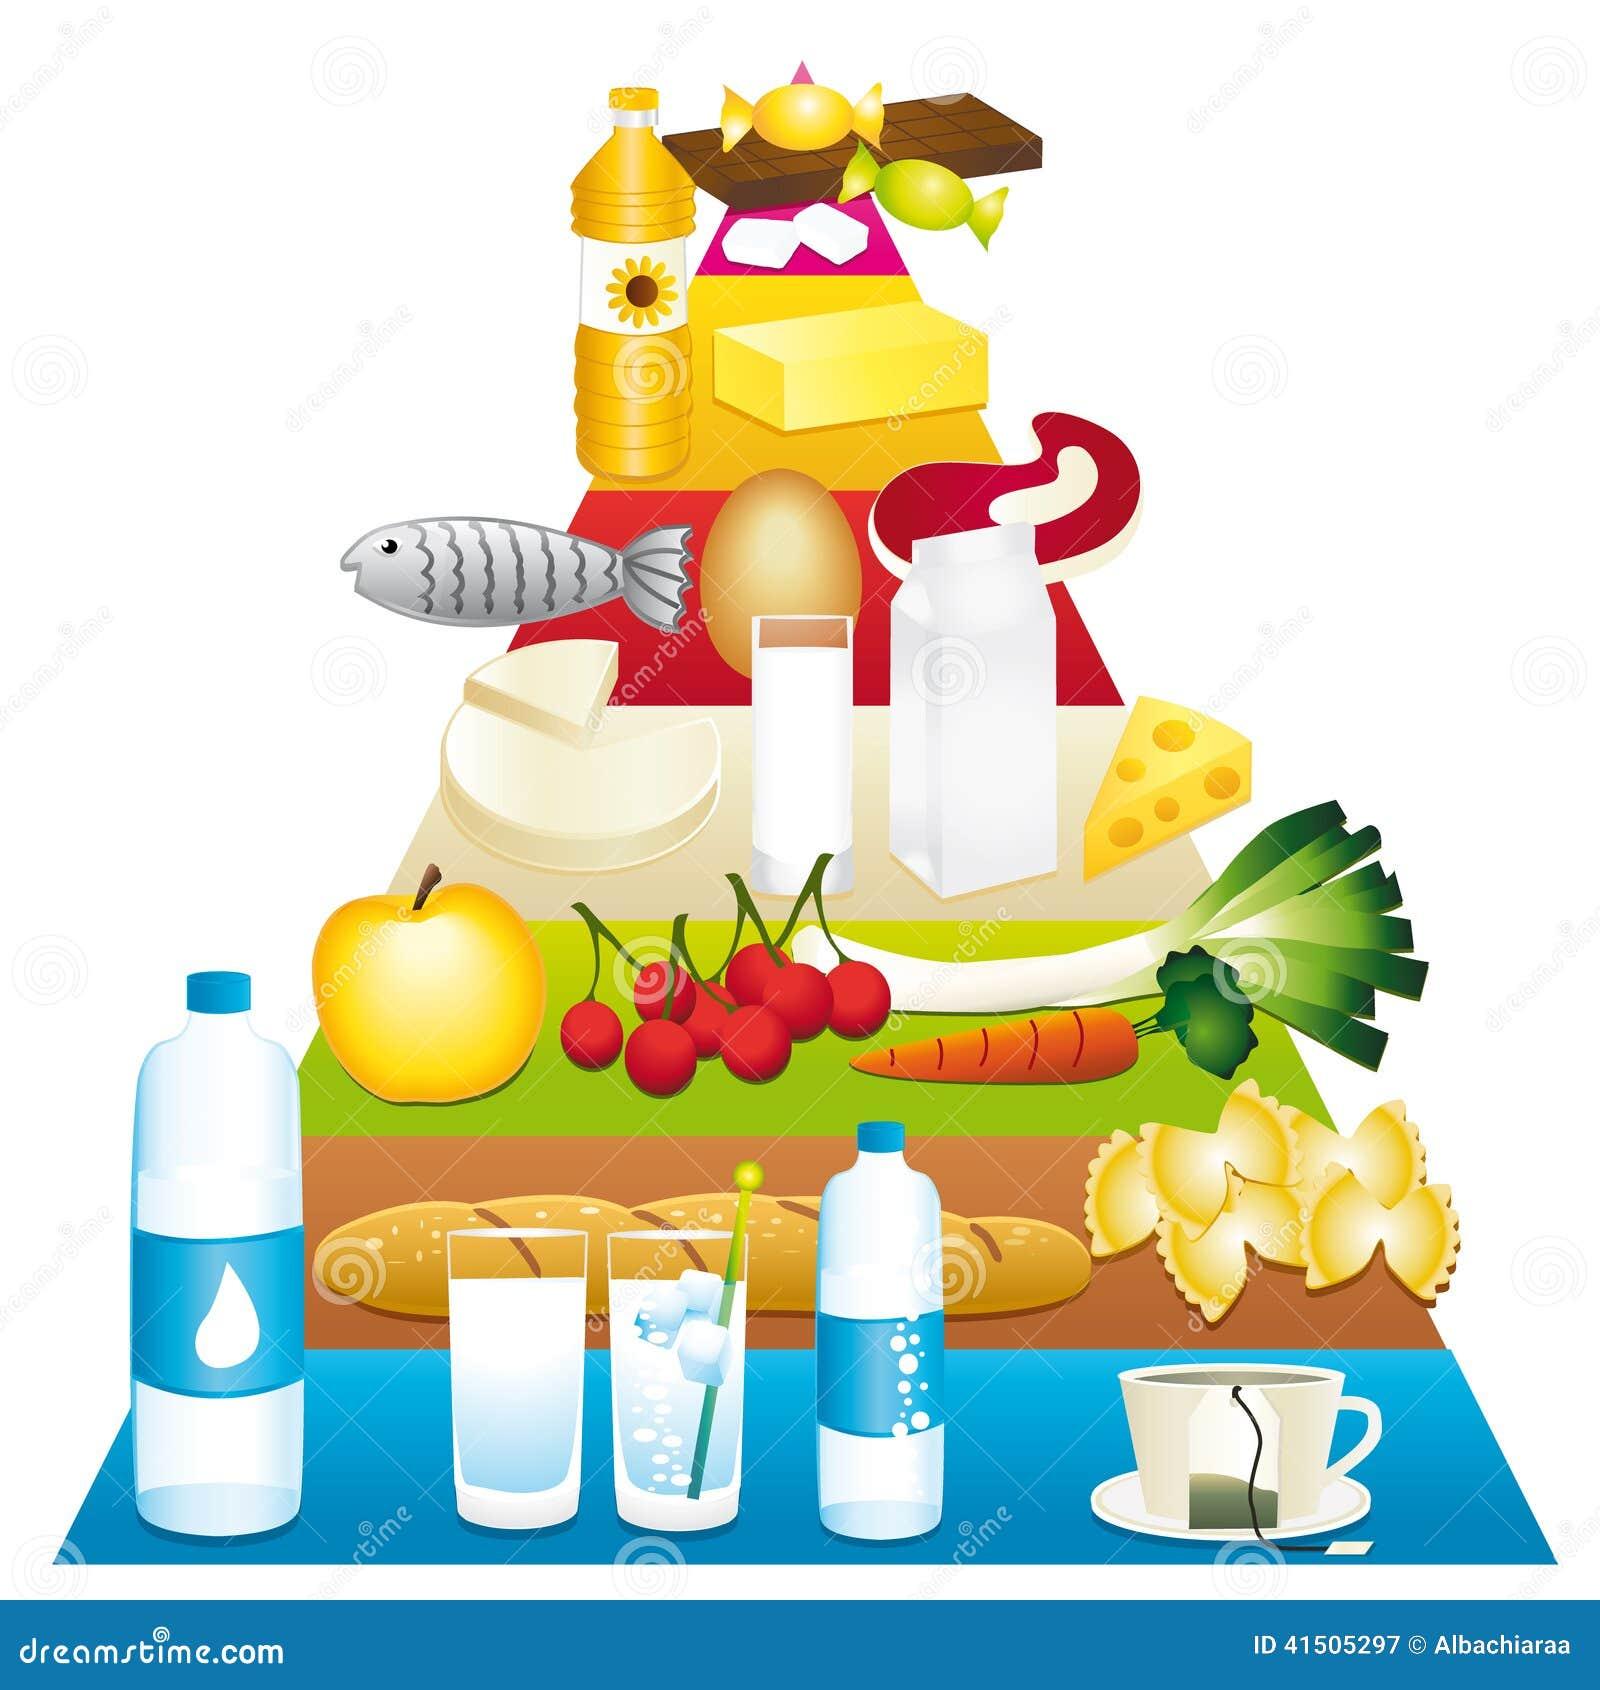 tag res de pyramide alimentaire illustration stock image 41505297. Black Bedroom Furniture Sets. Home Design Ideas